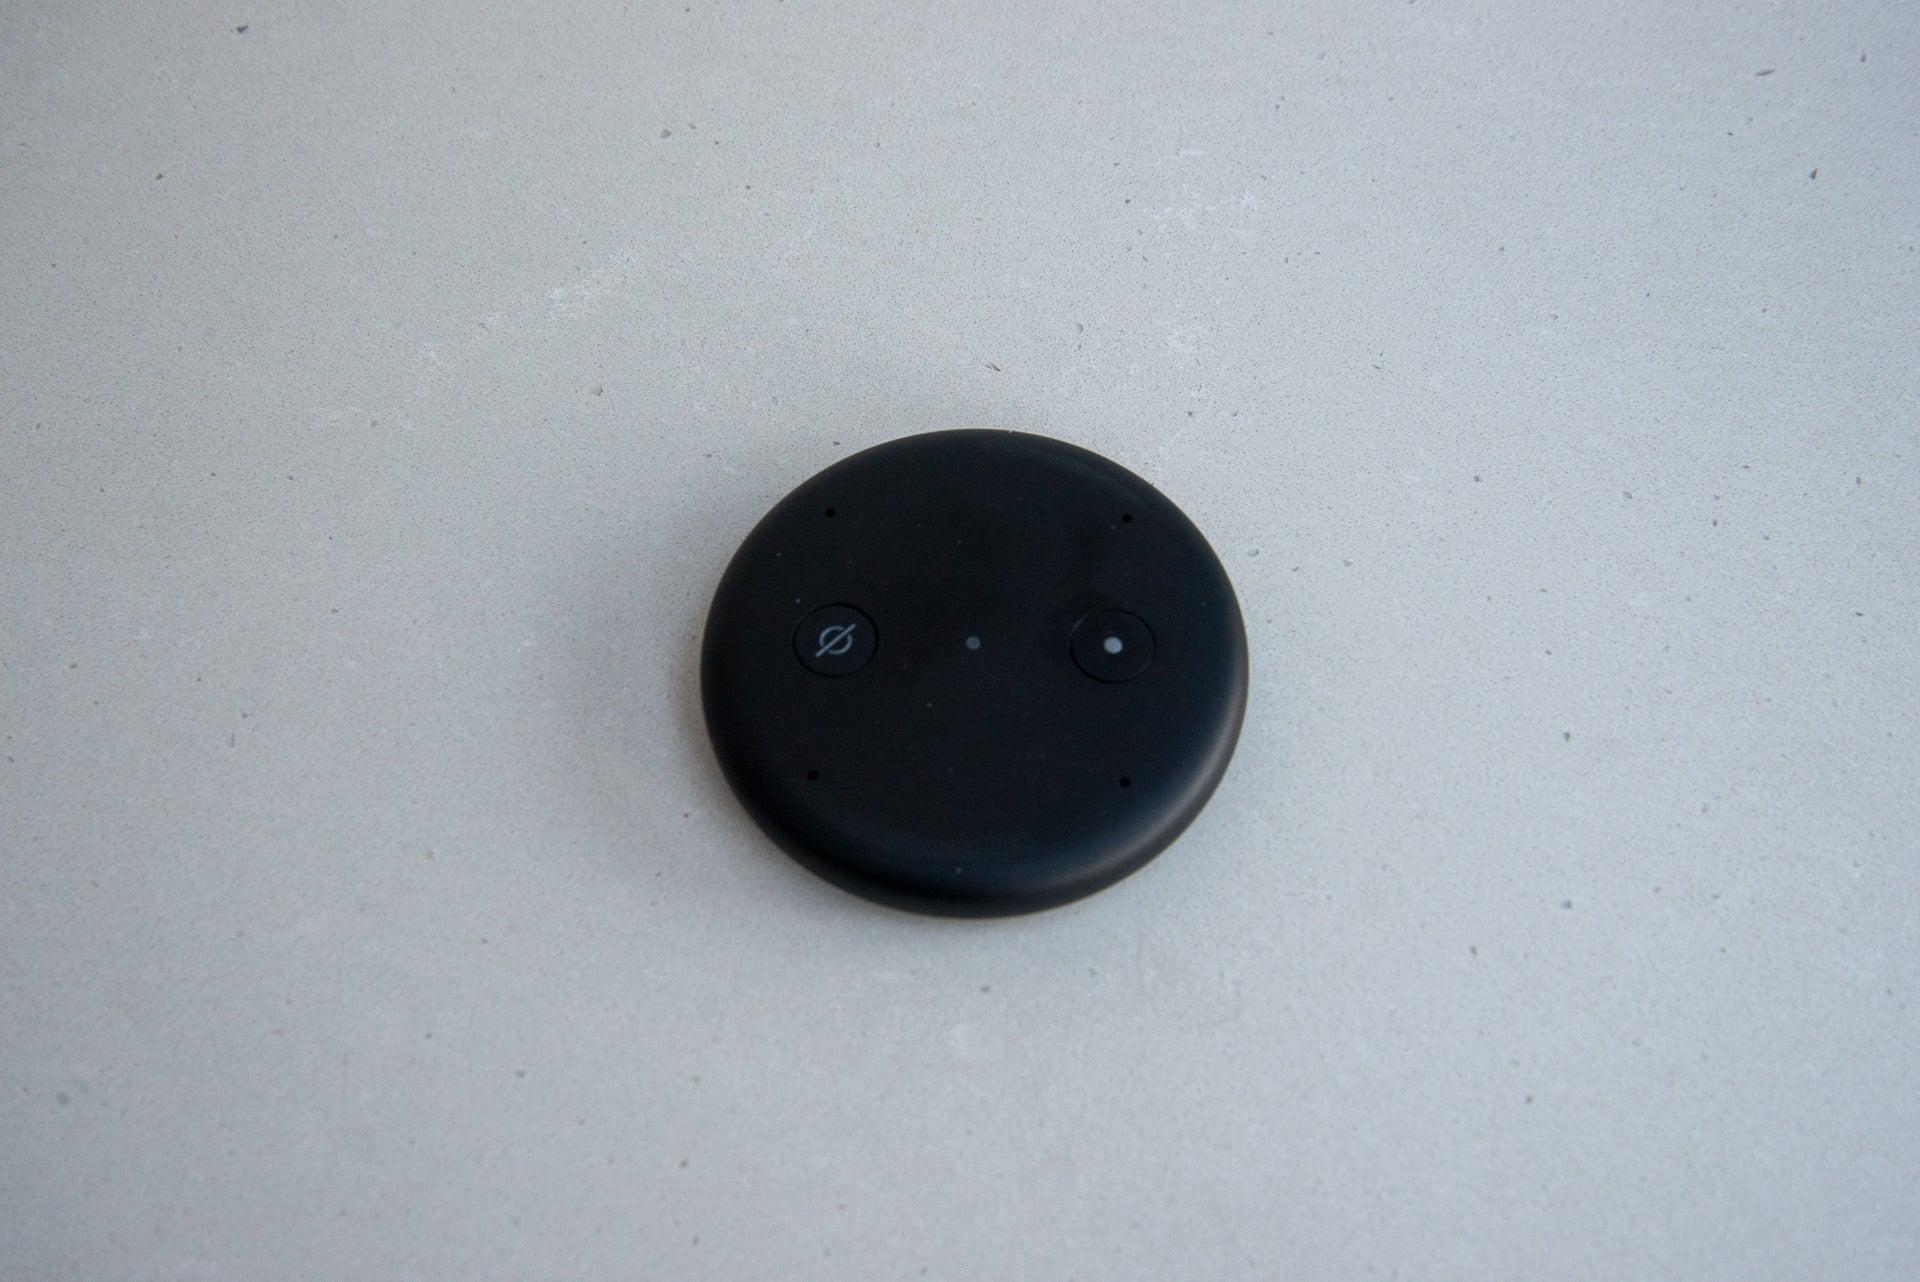 Amazon Echo Input top down